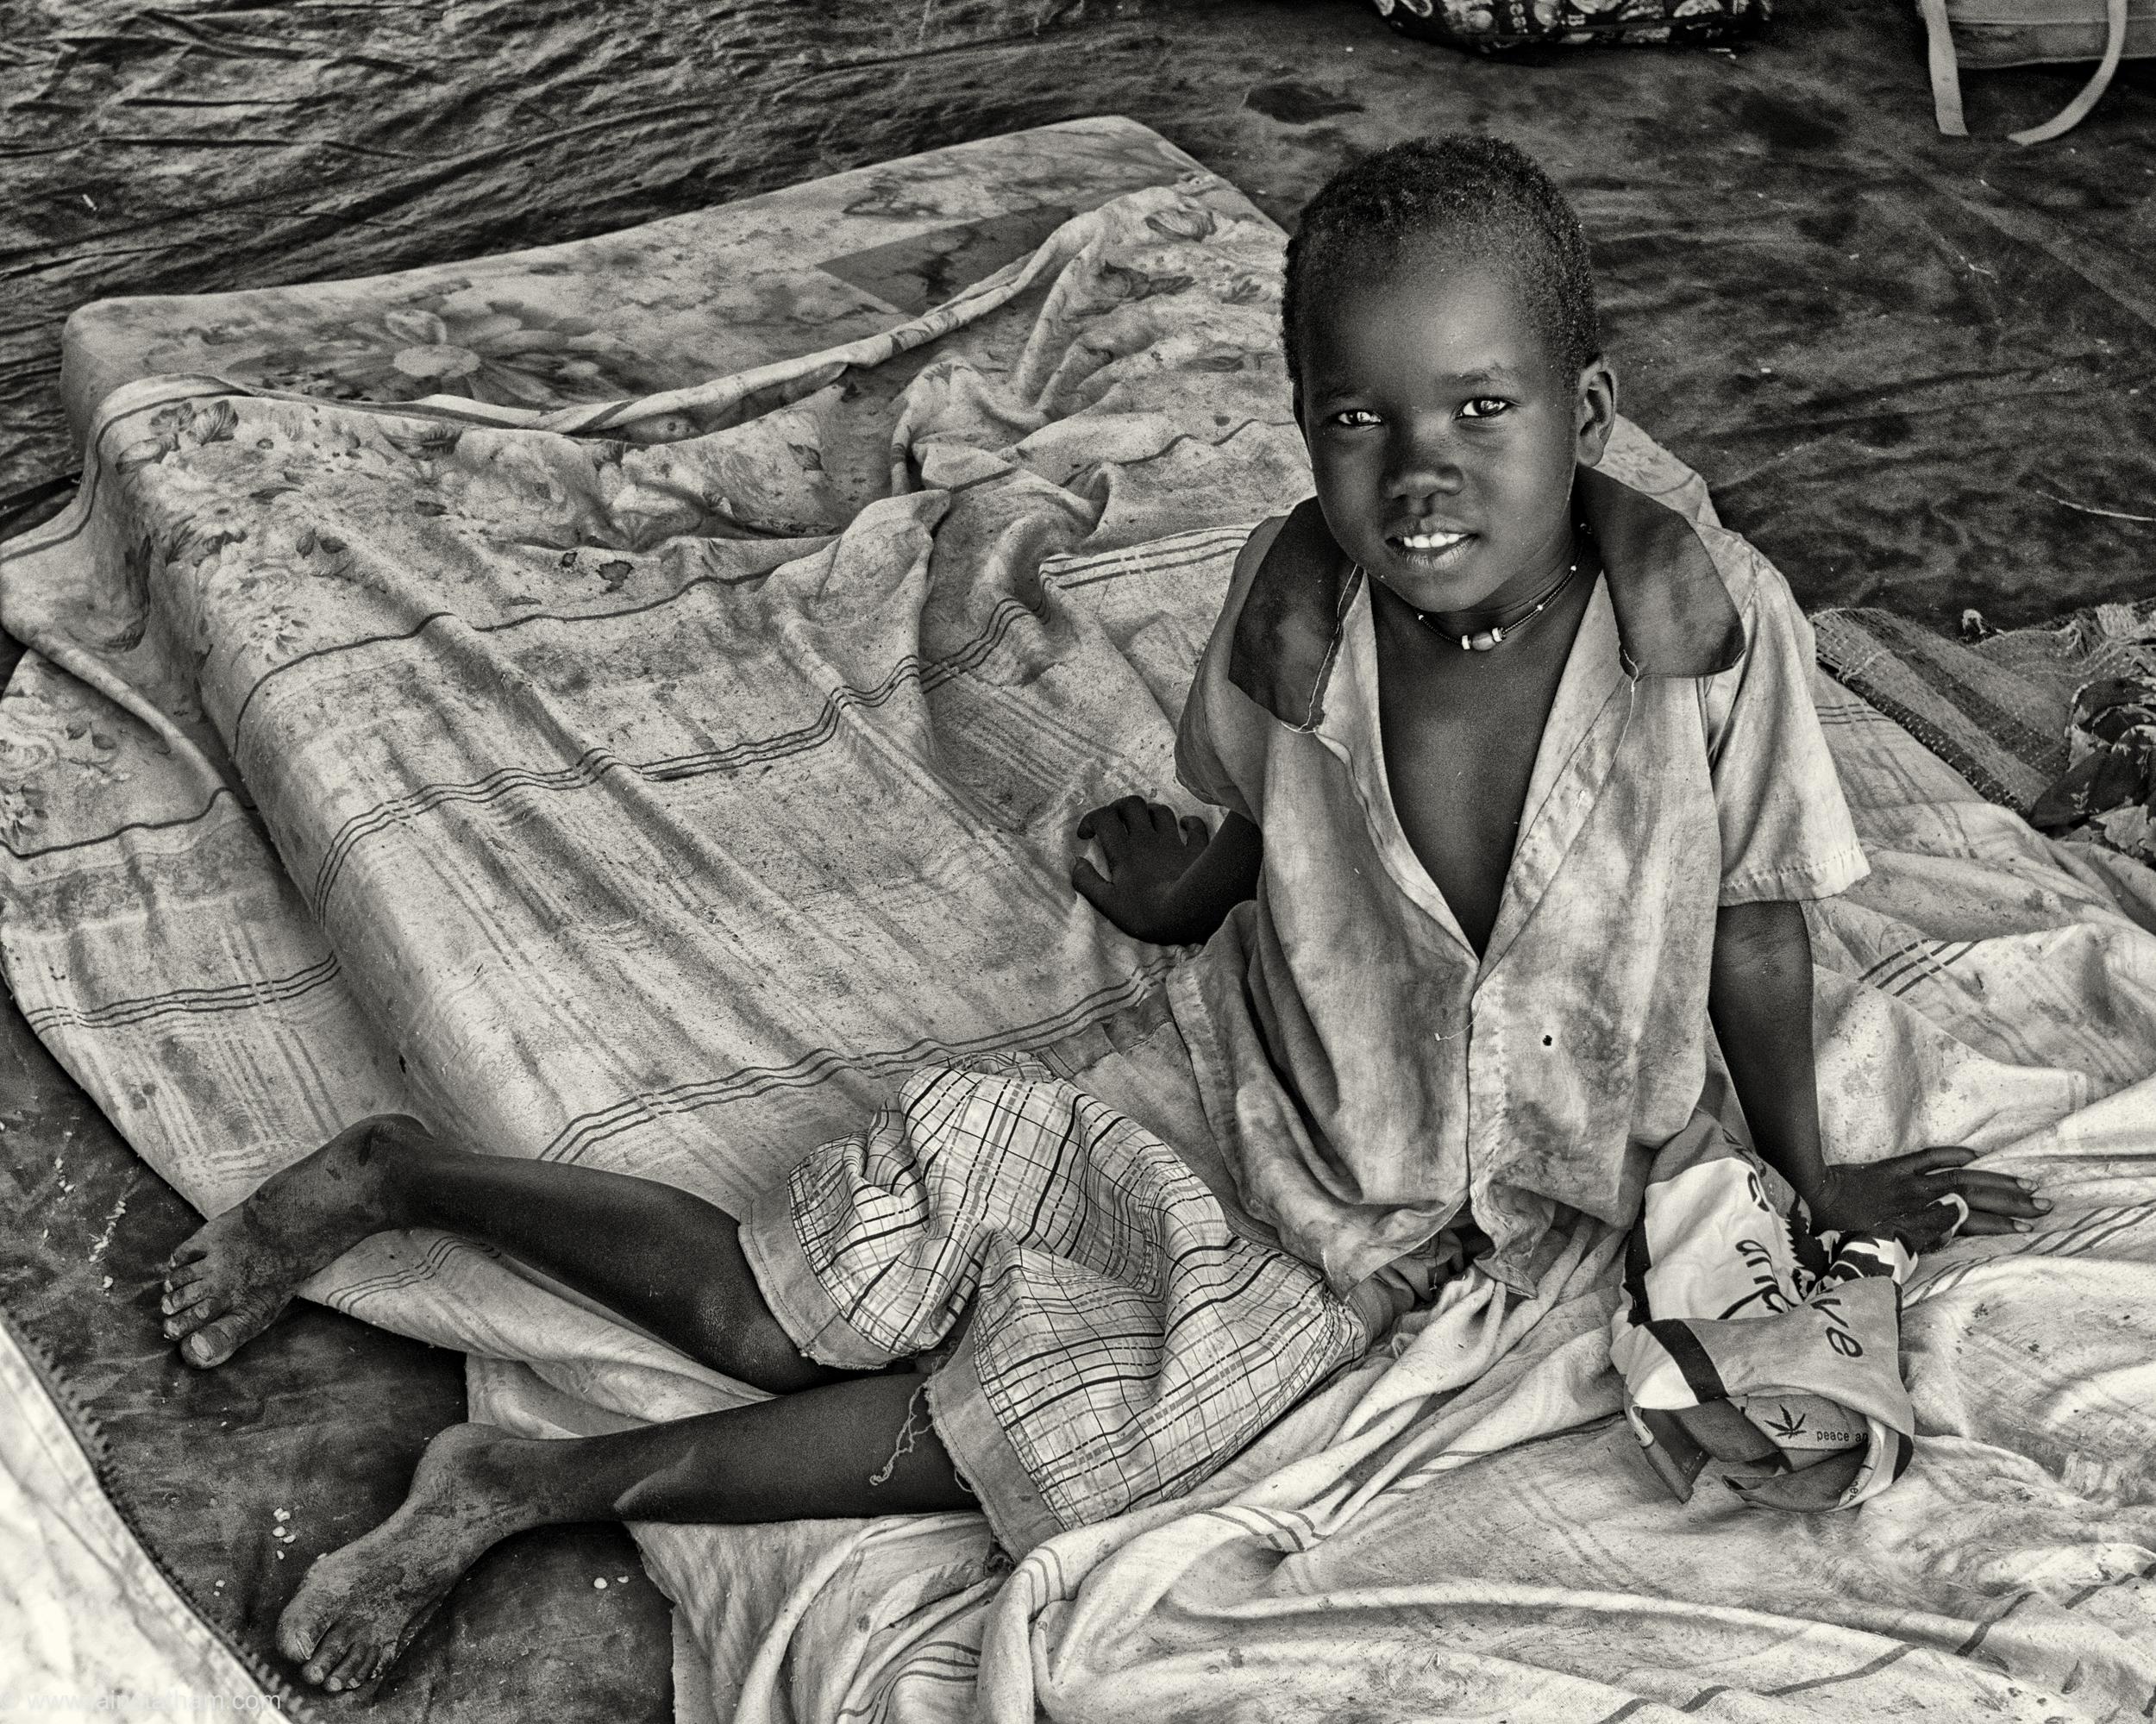 ug - south sudan refugees - dziapi - bw-14.jpg